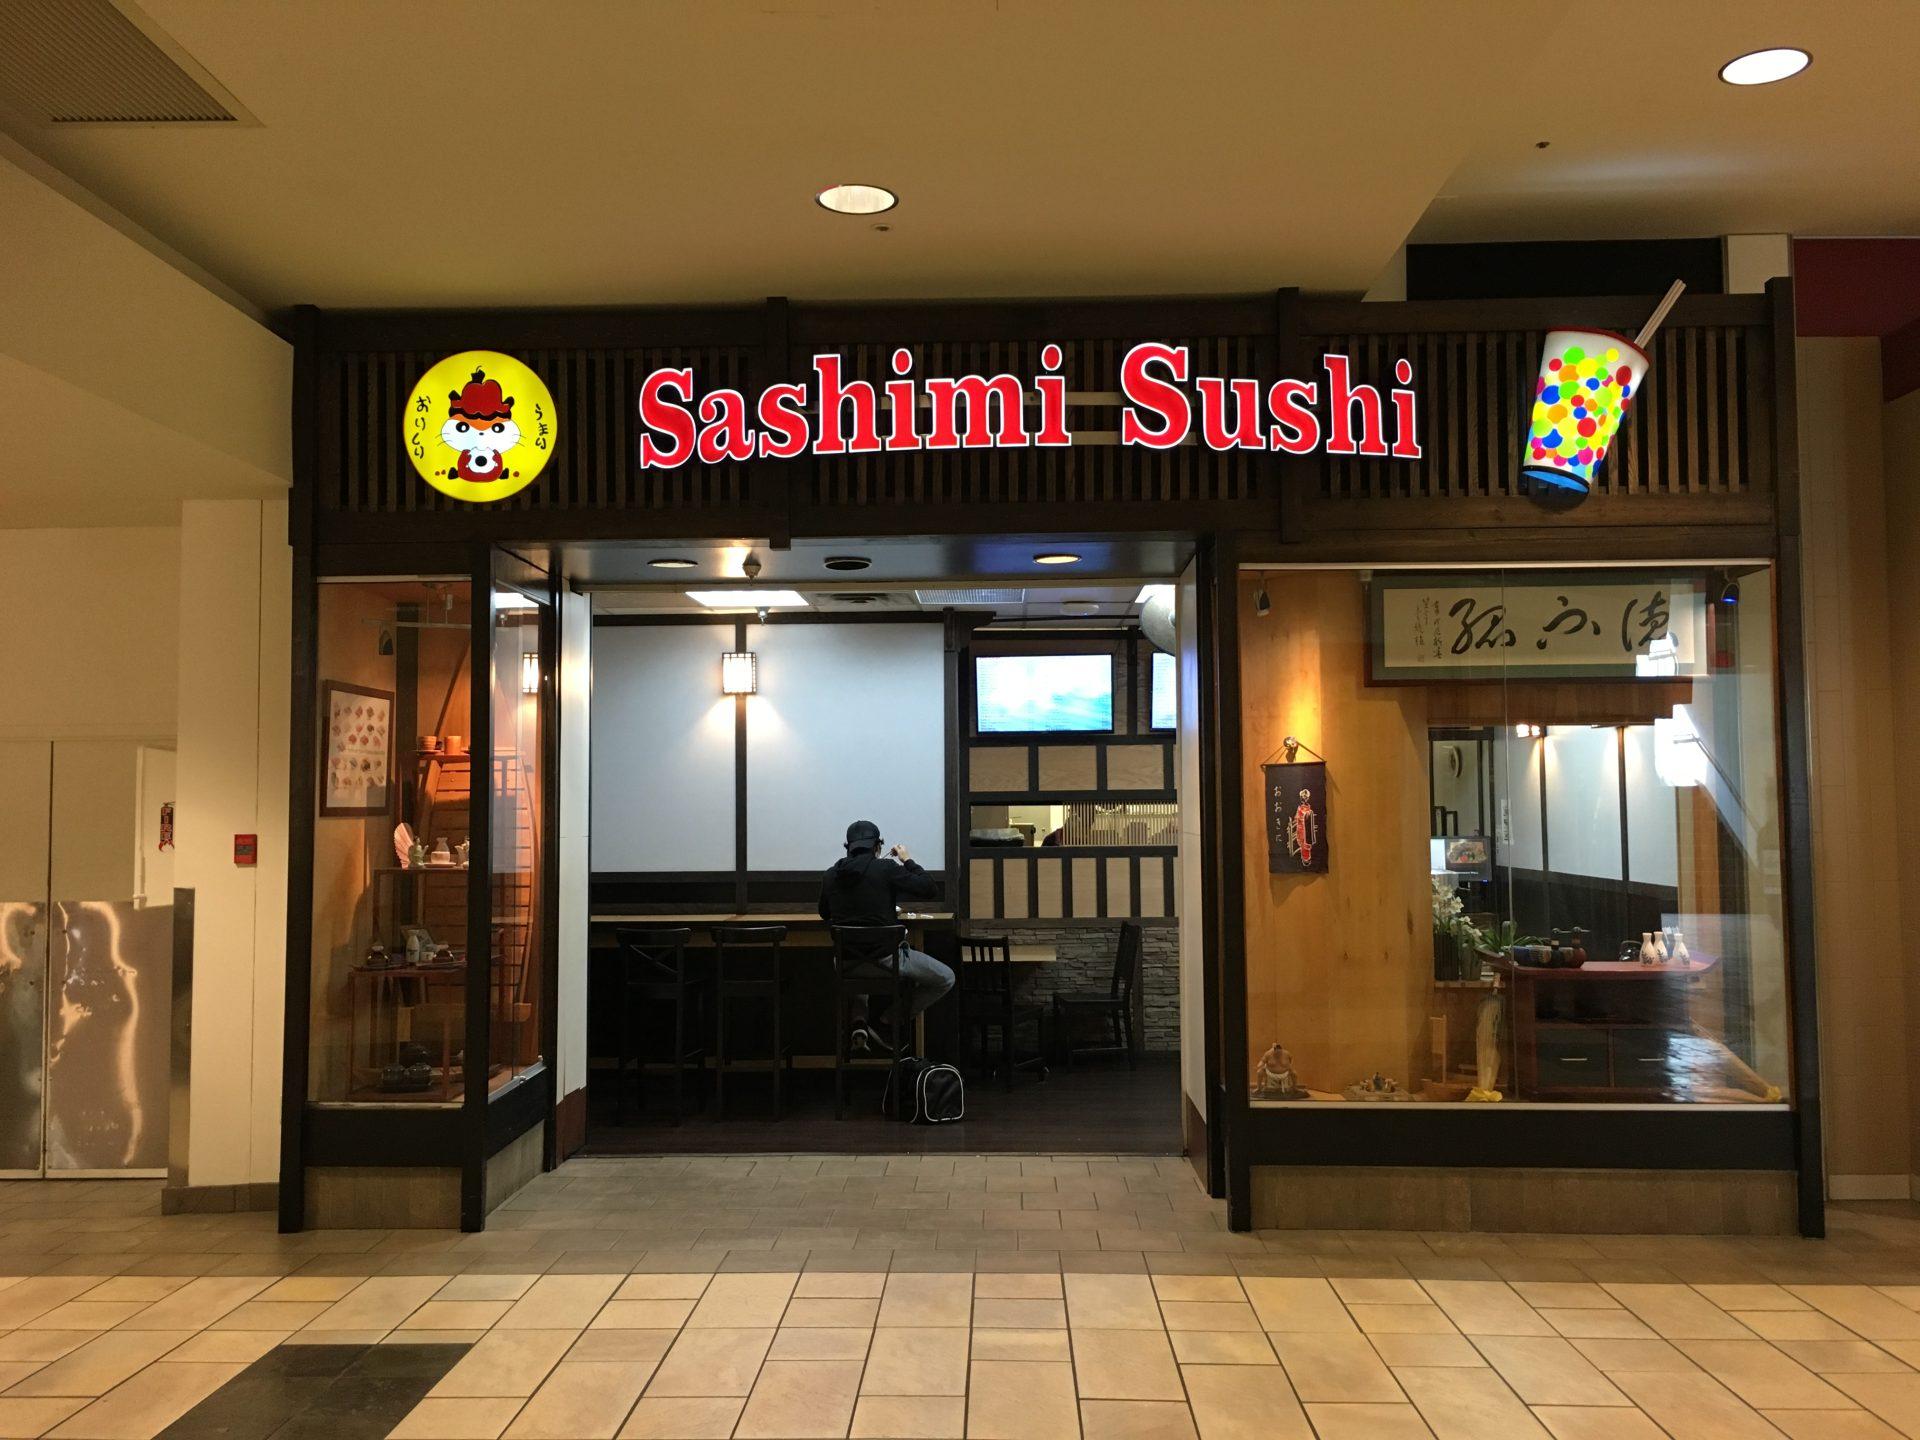 Sashimi Sushi in Lougheed Mall